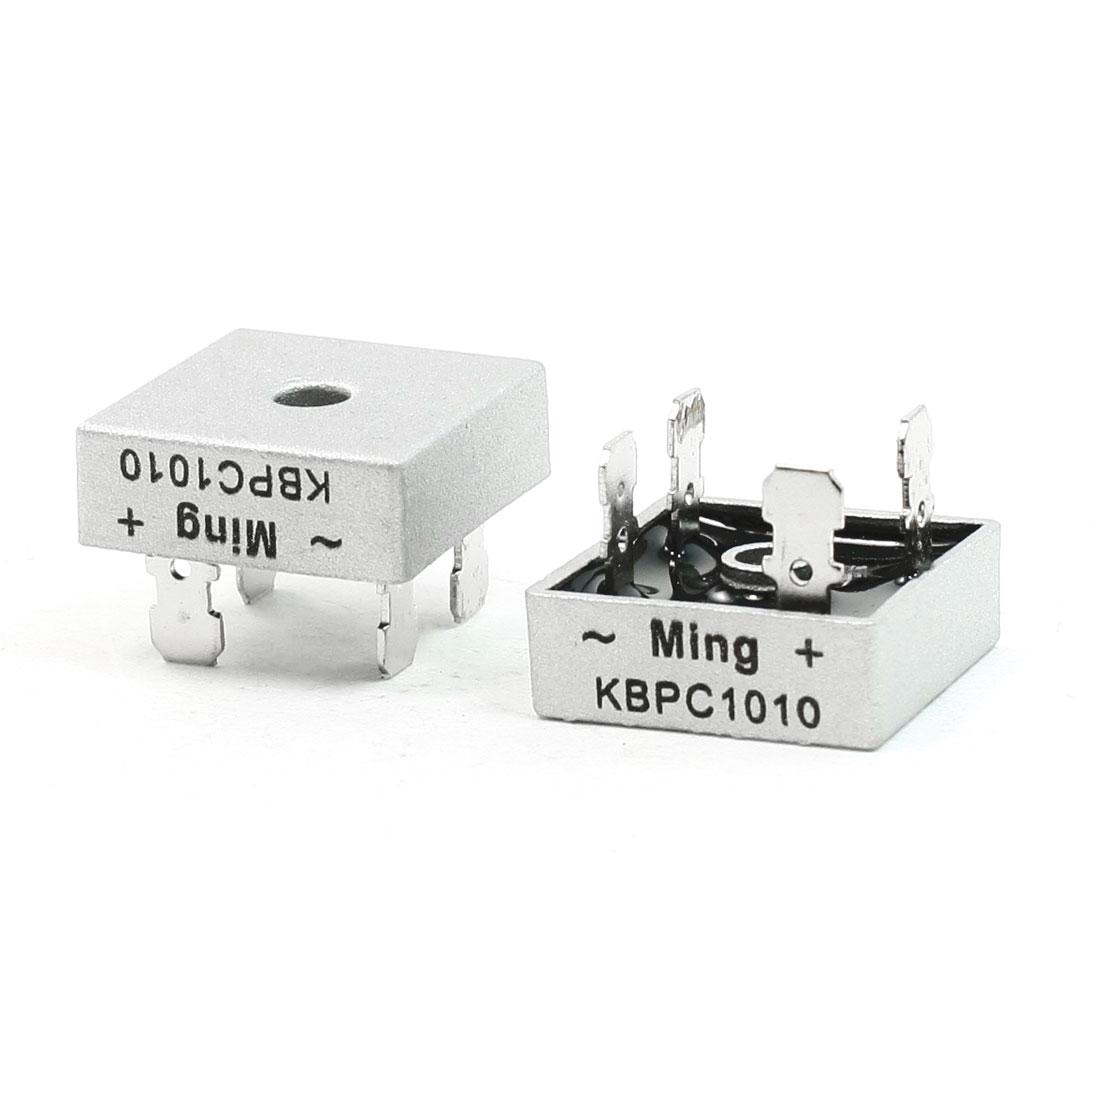 2 Pcs Ming KBPC1010 1000 Volt Bridge Rectifier Metal Case 1000V 10A Diode Bridge